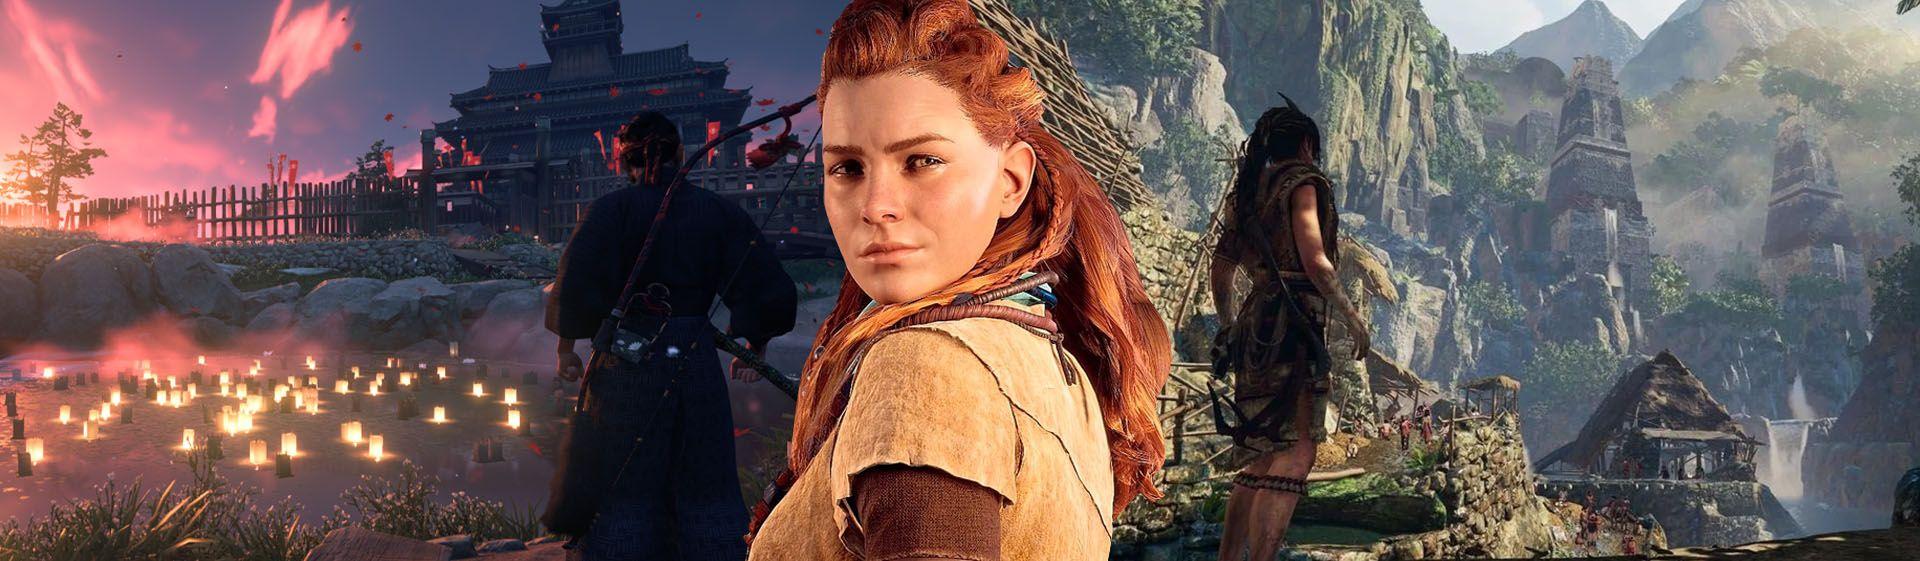 Capa mostra o personagem principal de Ghost of Tsushima, Alloy de Horizon Forbidden West e Lara Croft